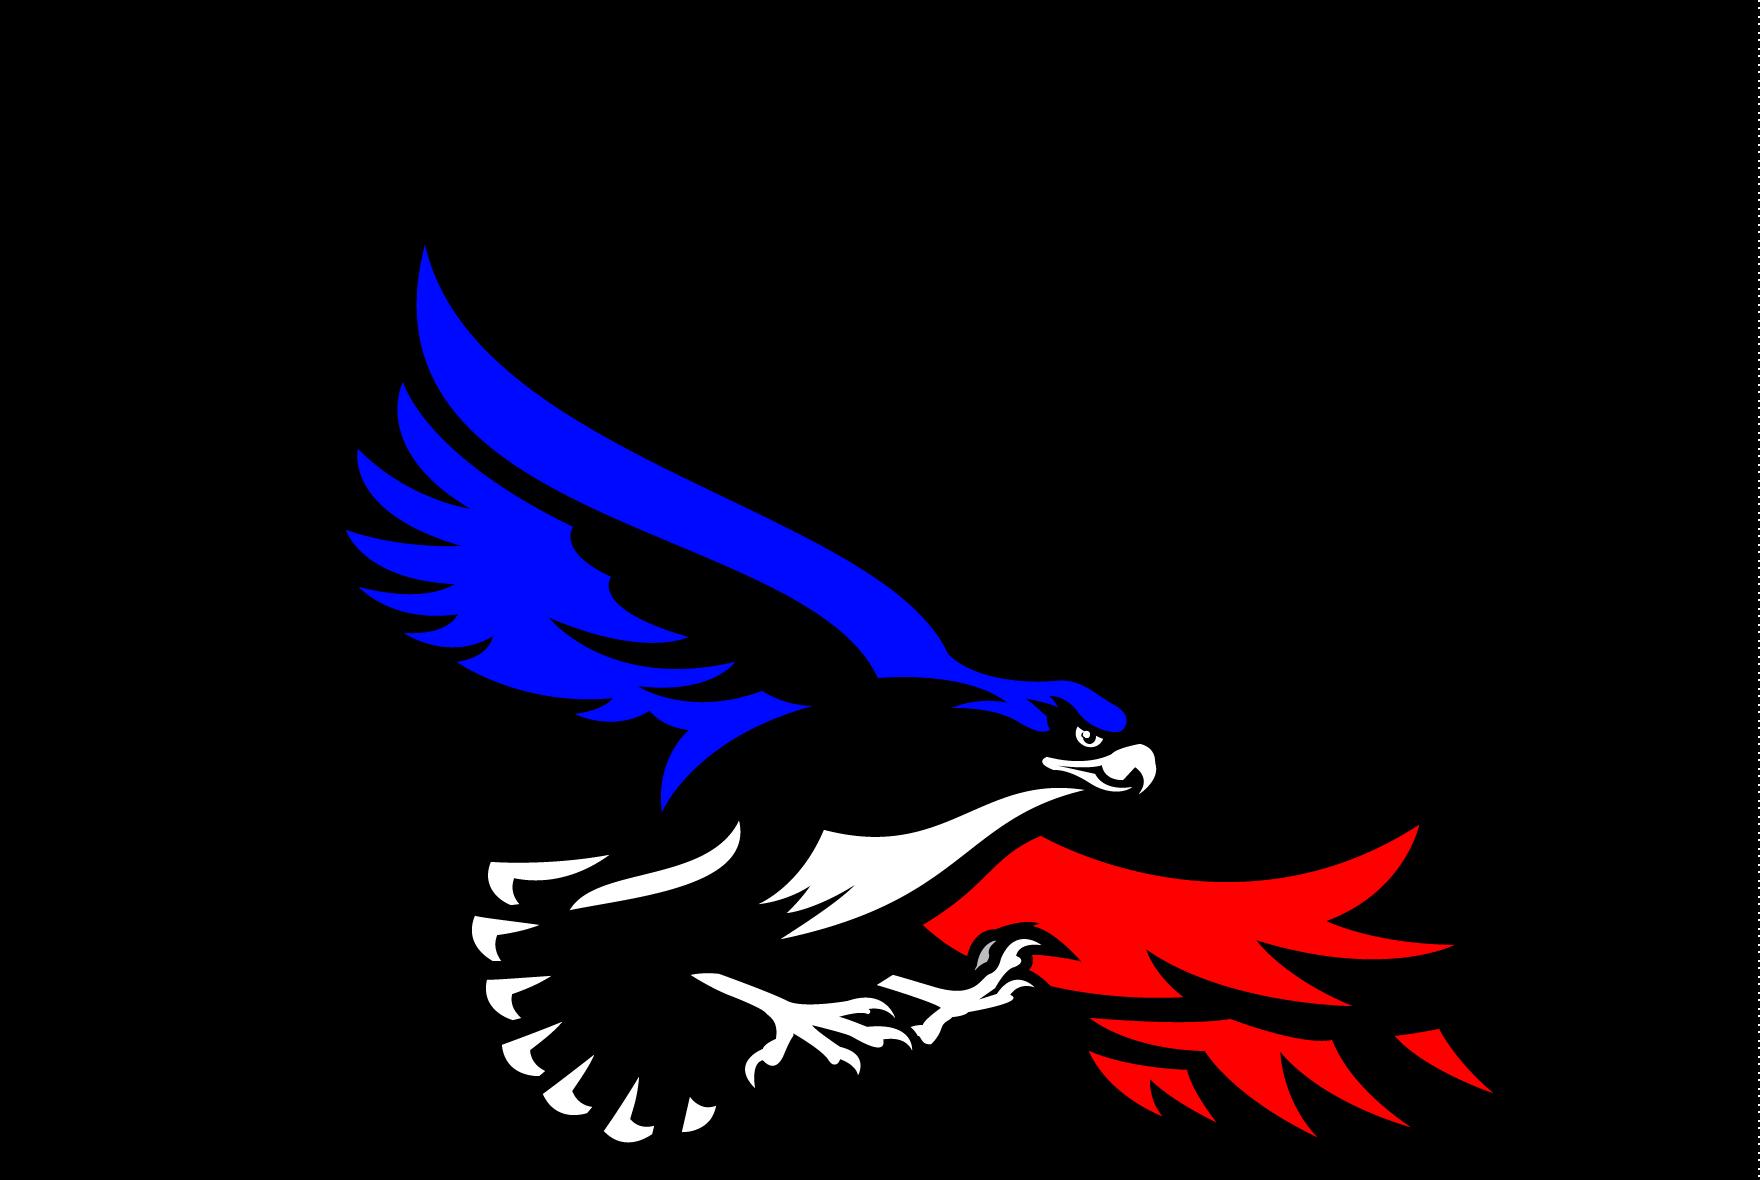 Blackhawks logo